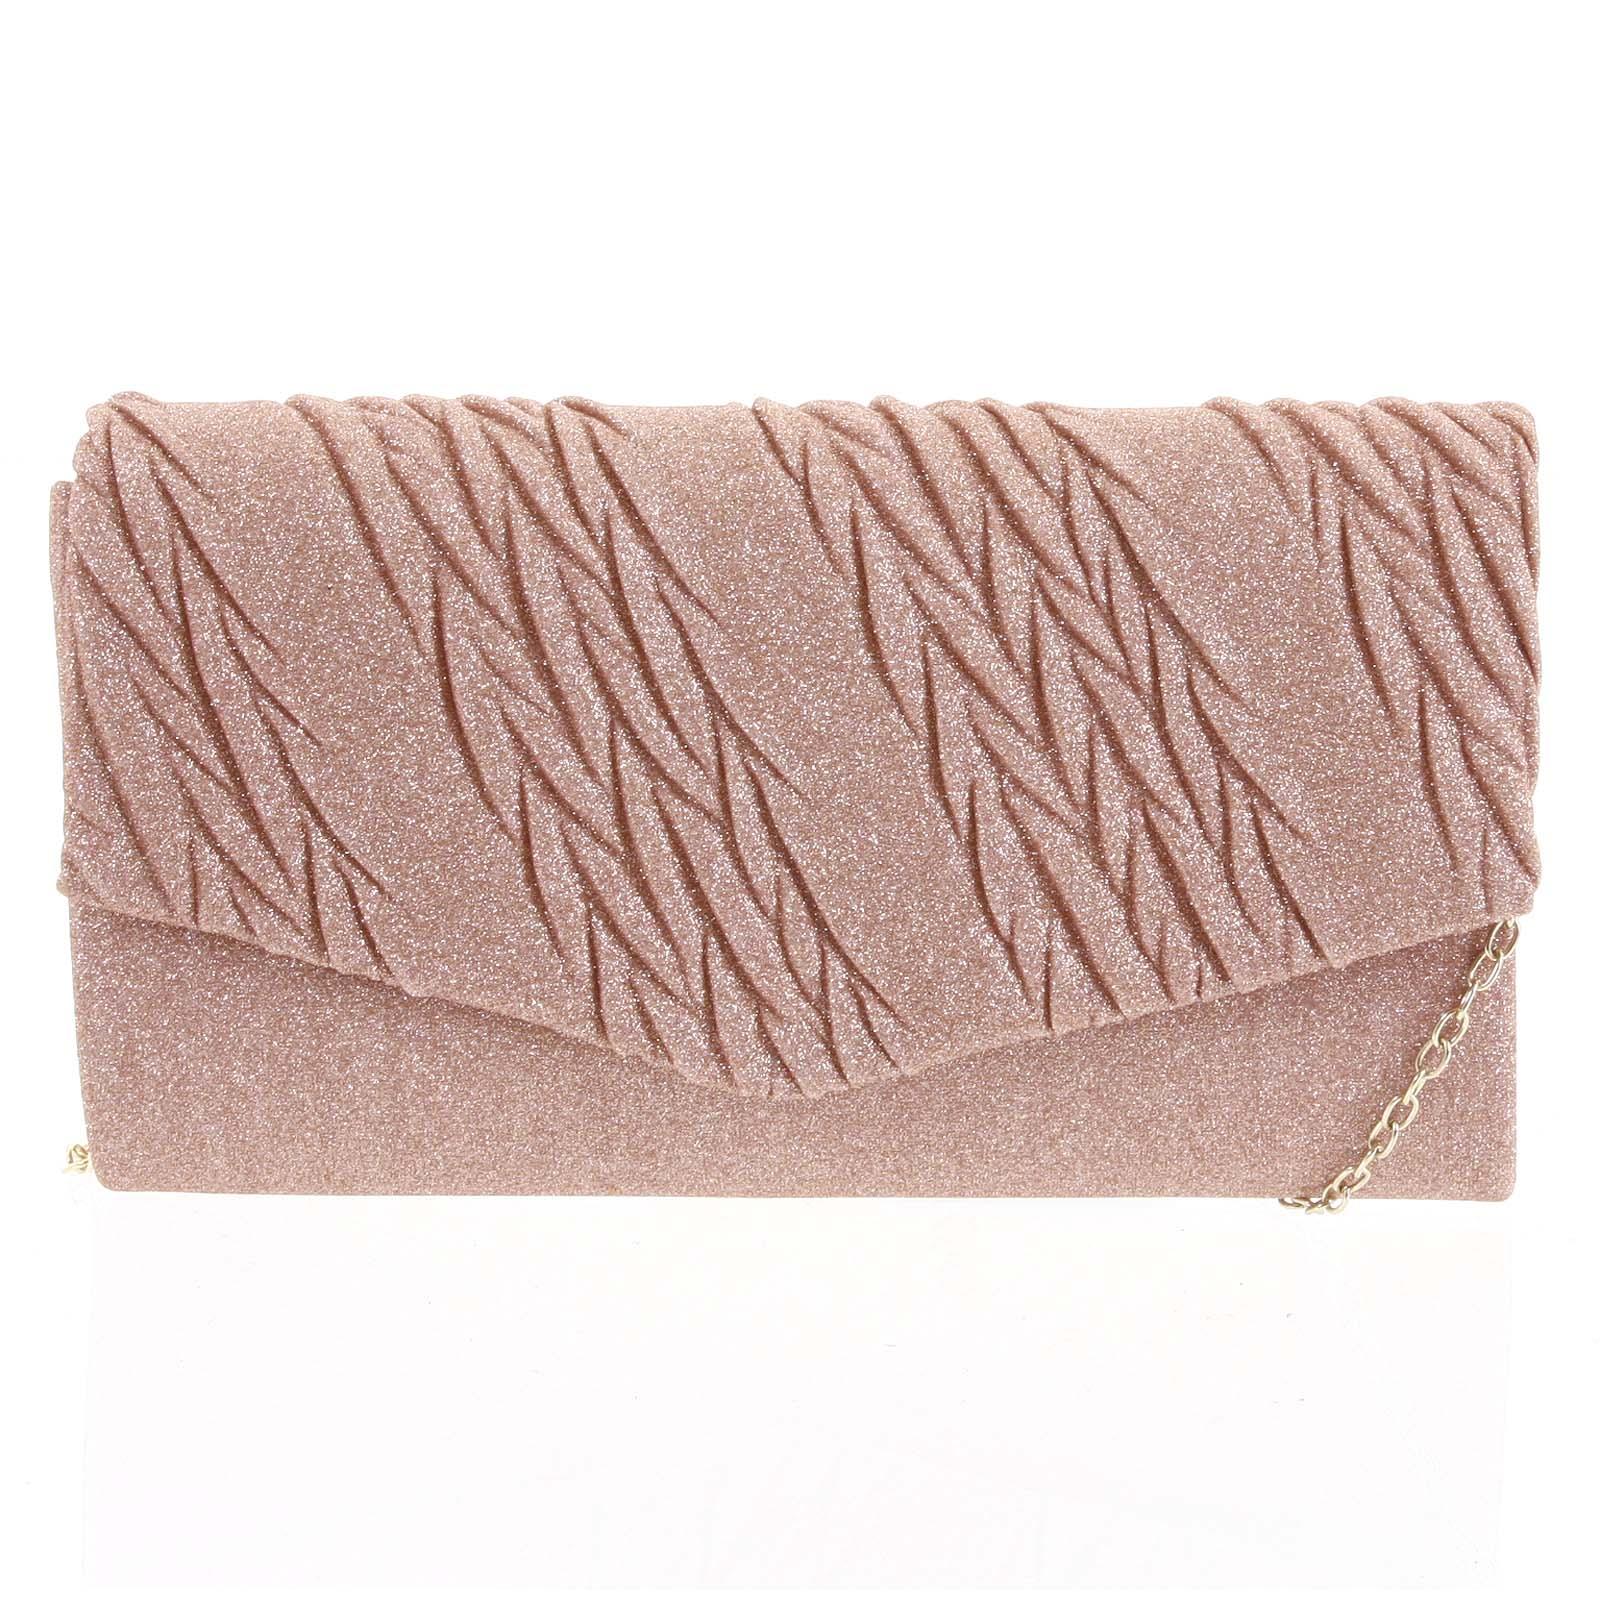 Dámska listová kabelka ružová - Michelle Moon Chael